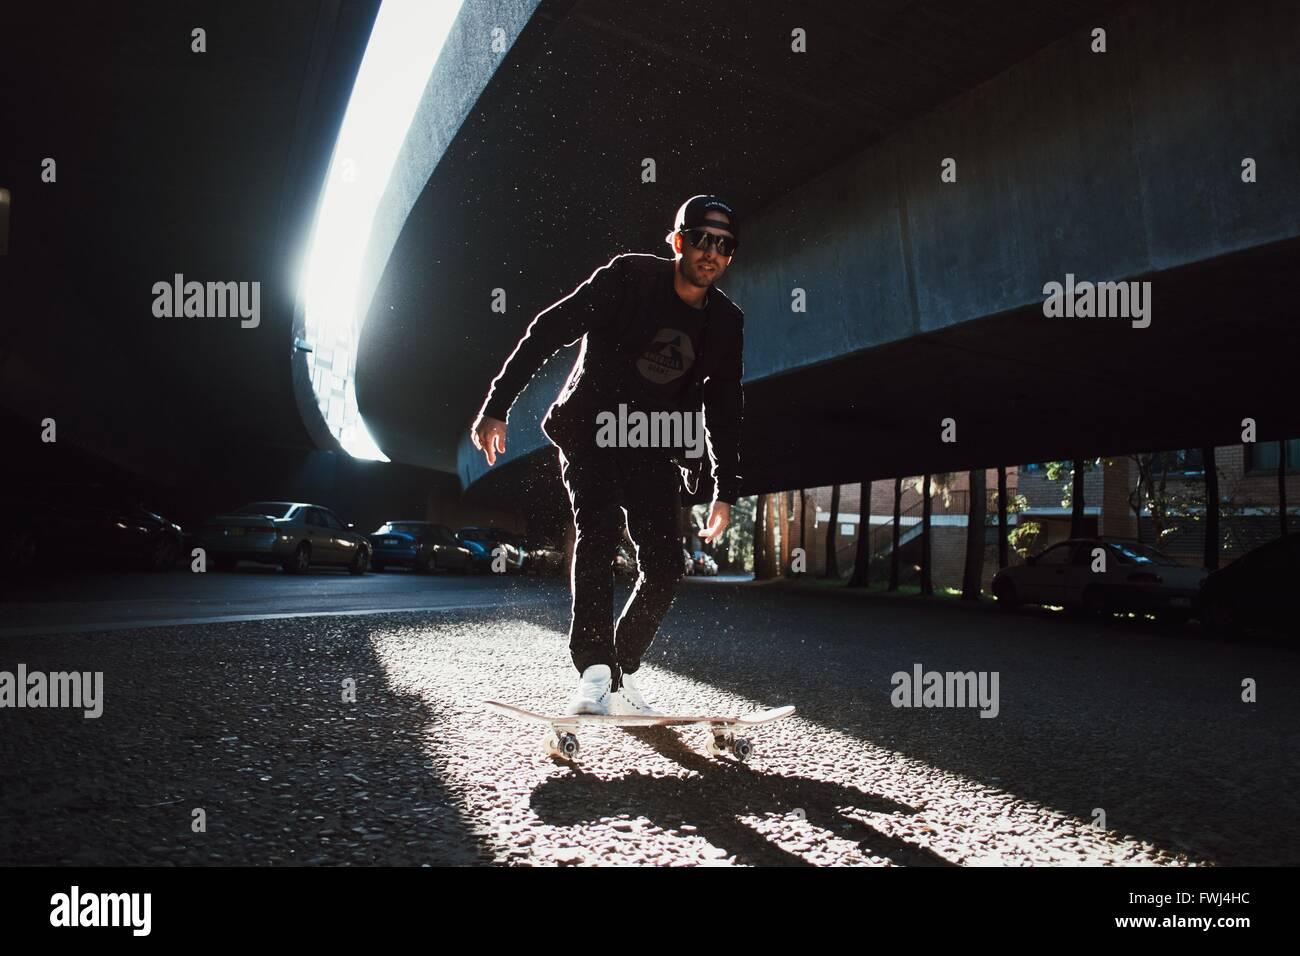 Mann auf Skateboard Stockbild